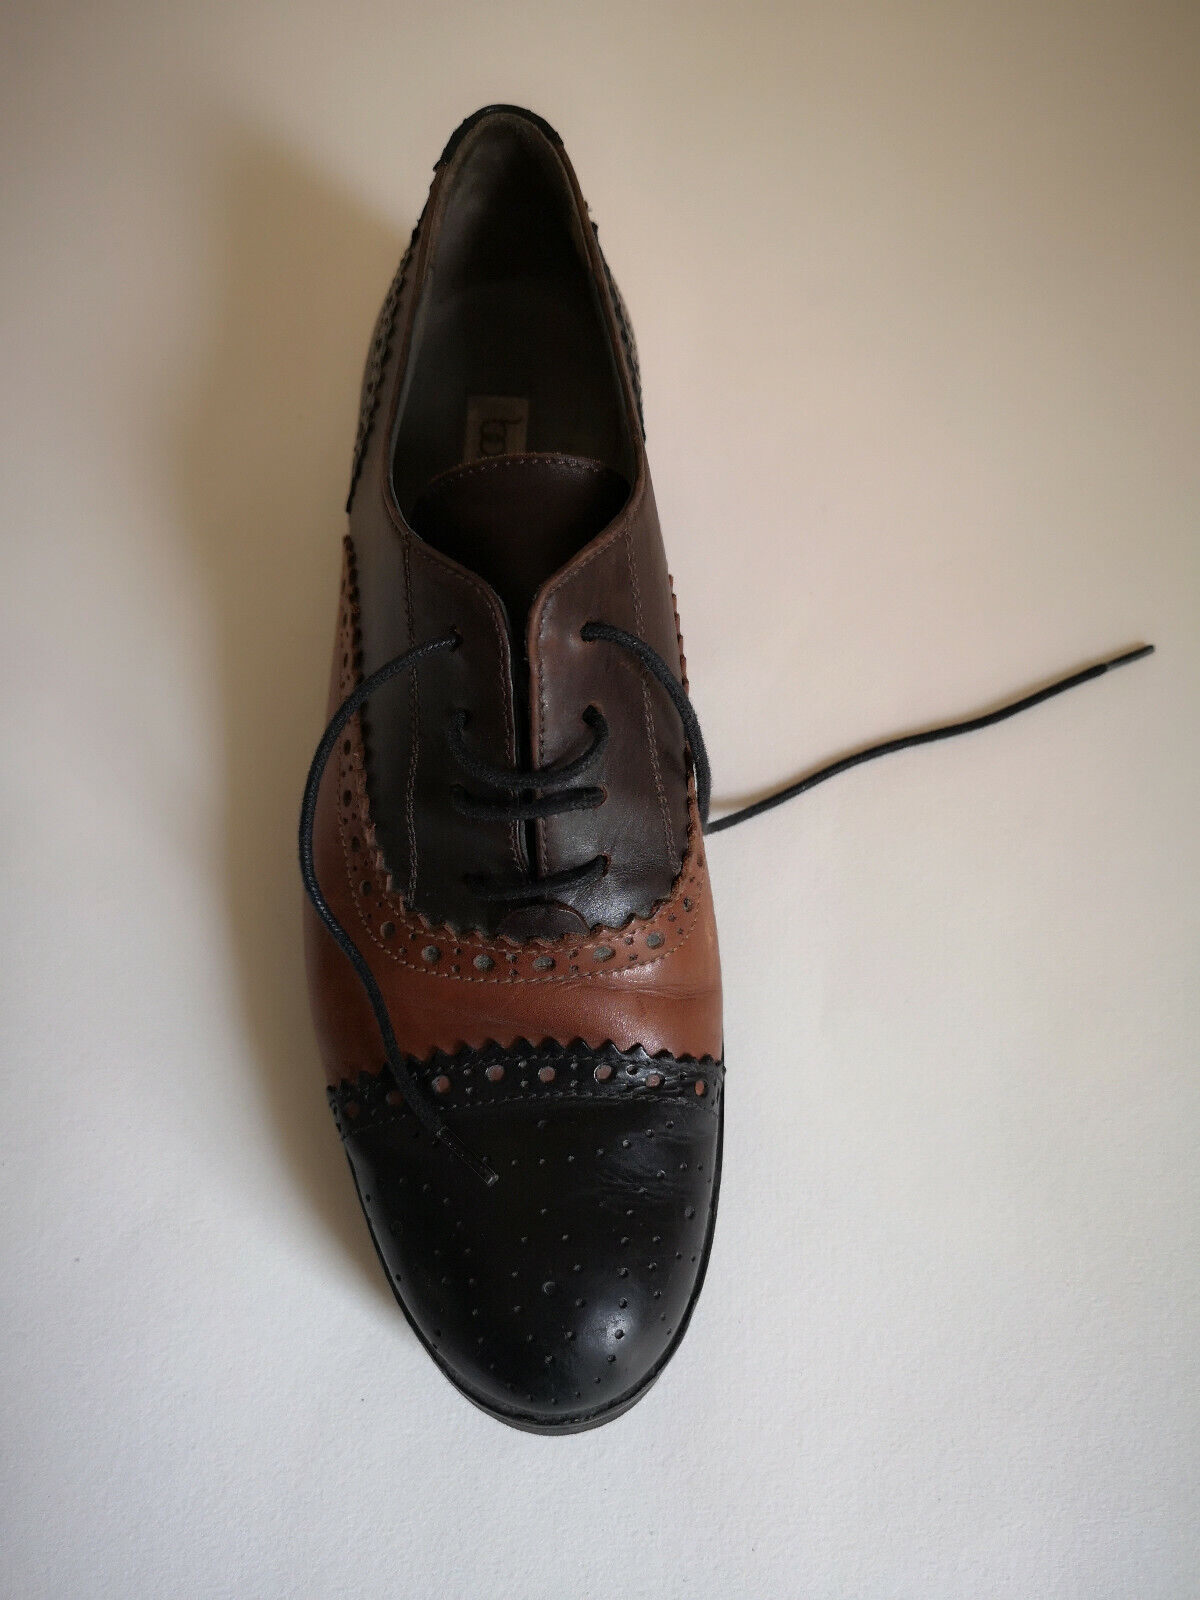 Les femmes Botticelli Cuir Plates chaussures Taille 36